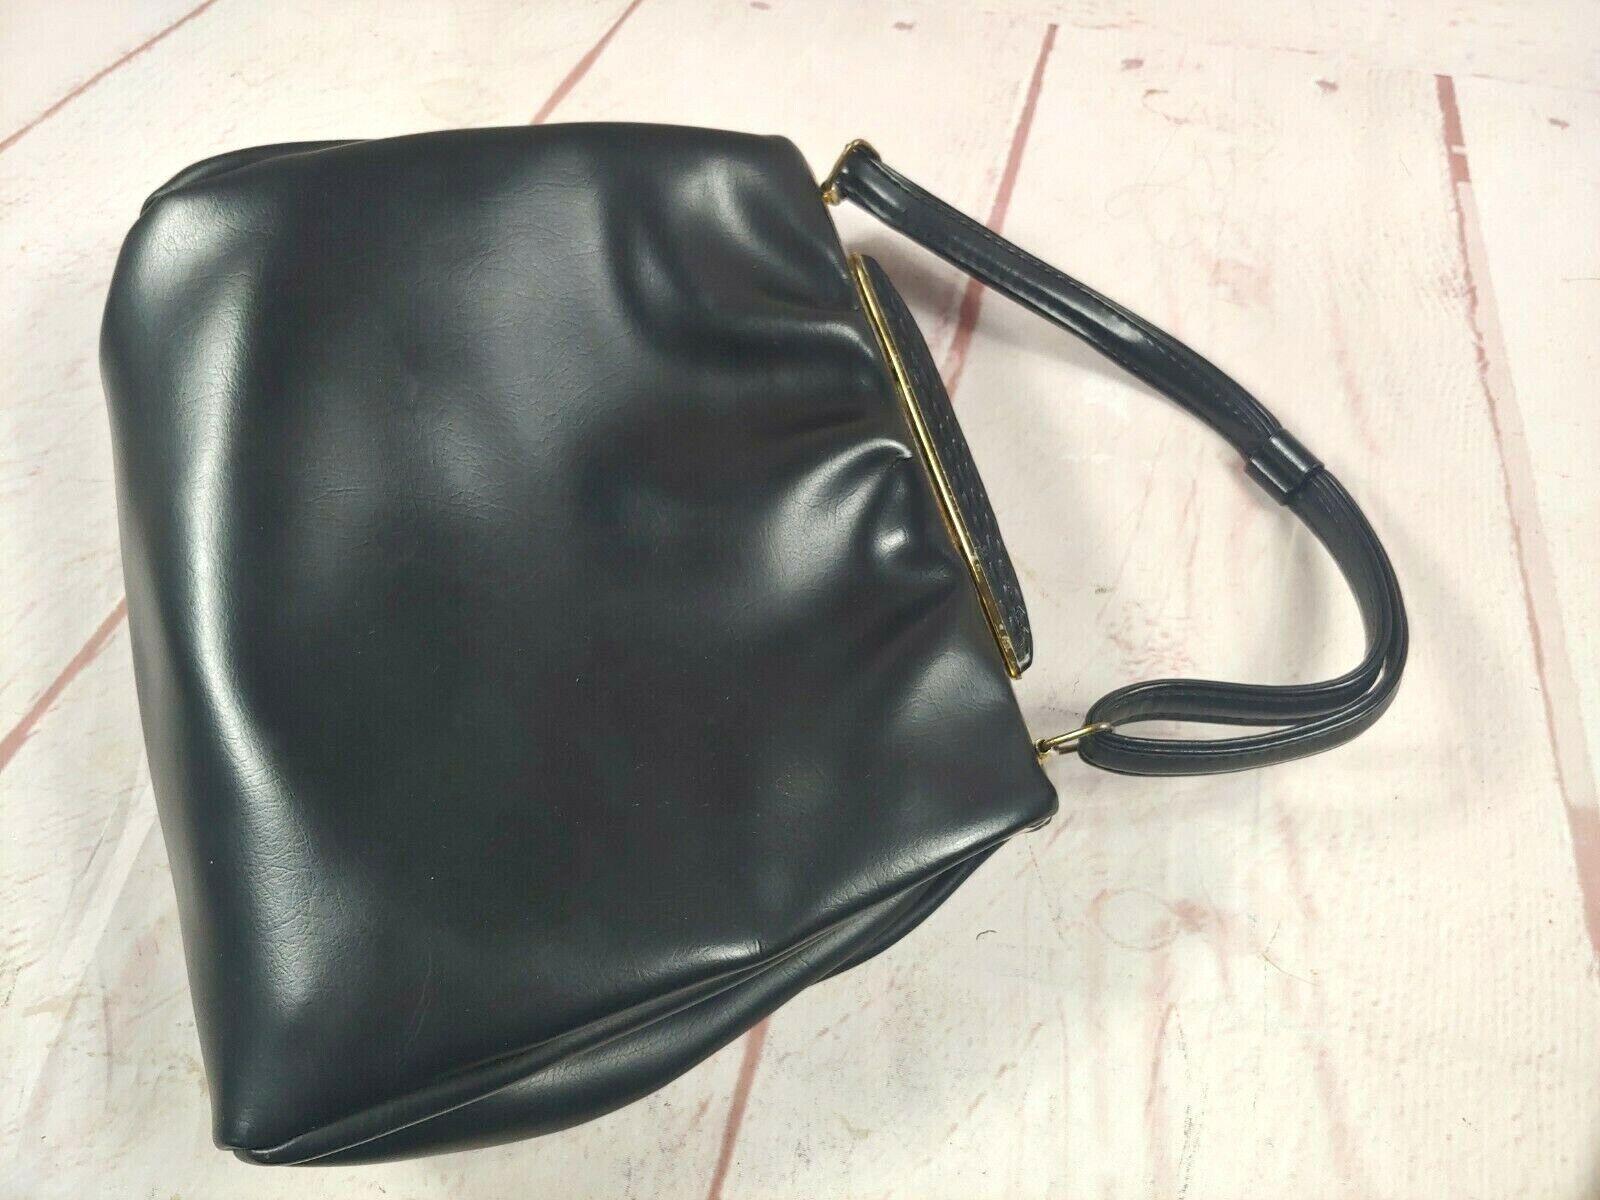 Vintage 1950's Black Leather Top Clasp Single Handle Kelly Handbag